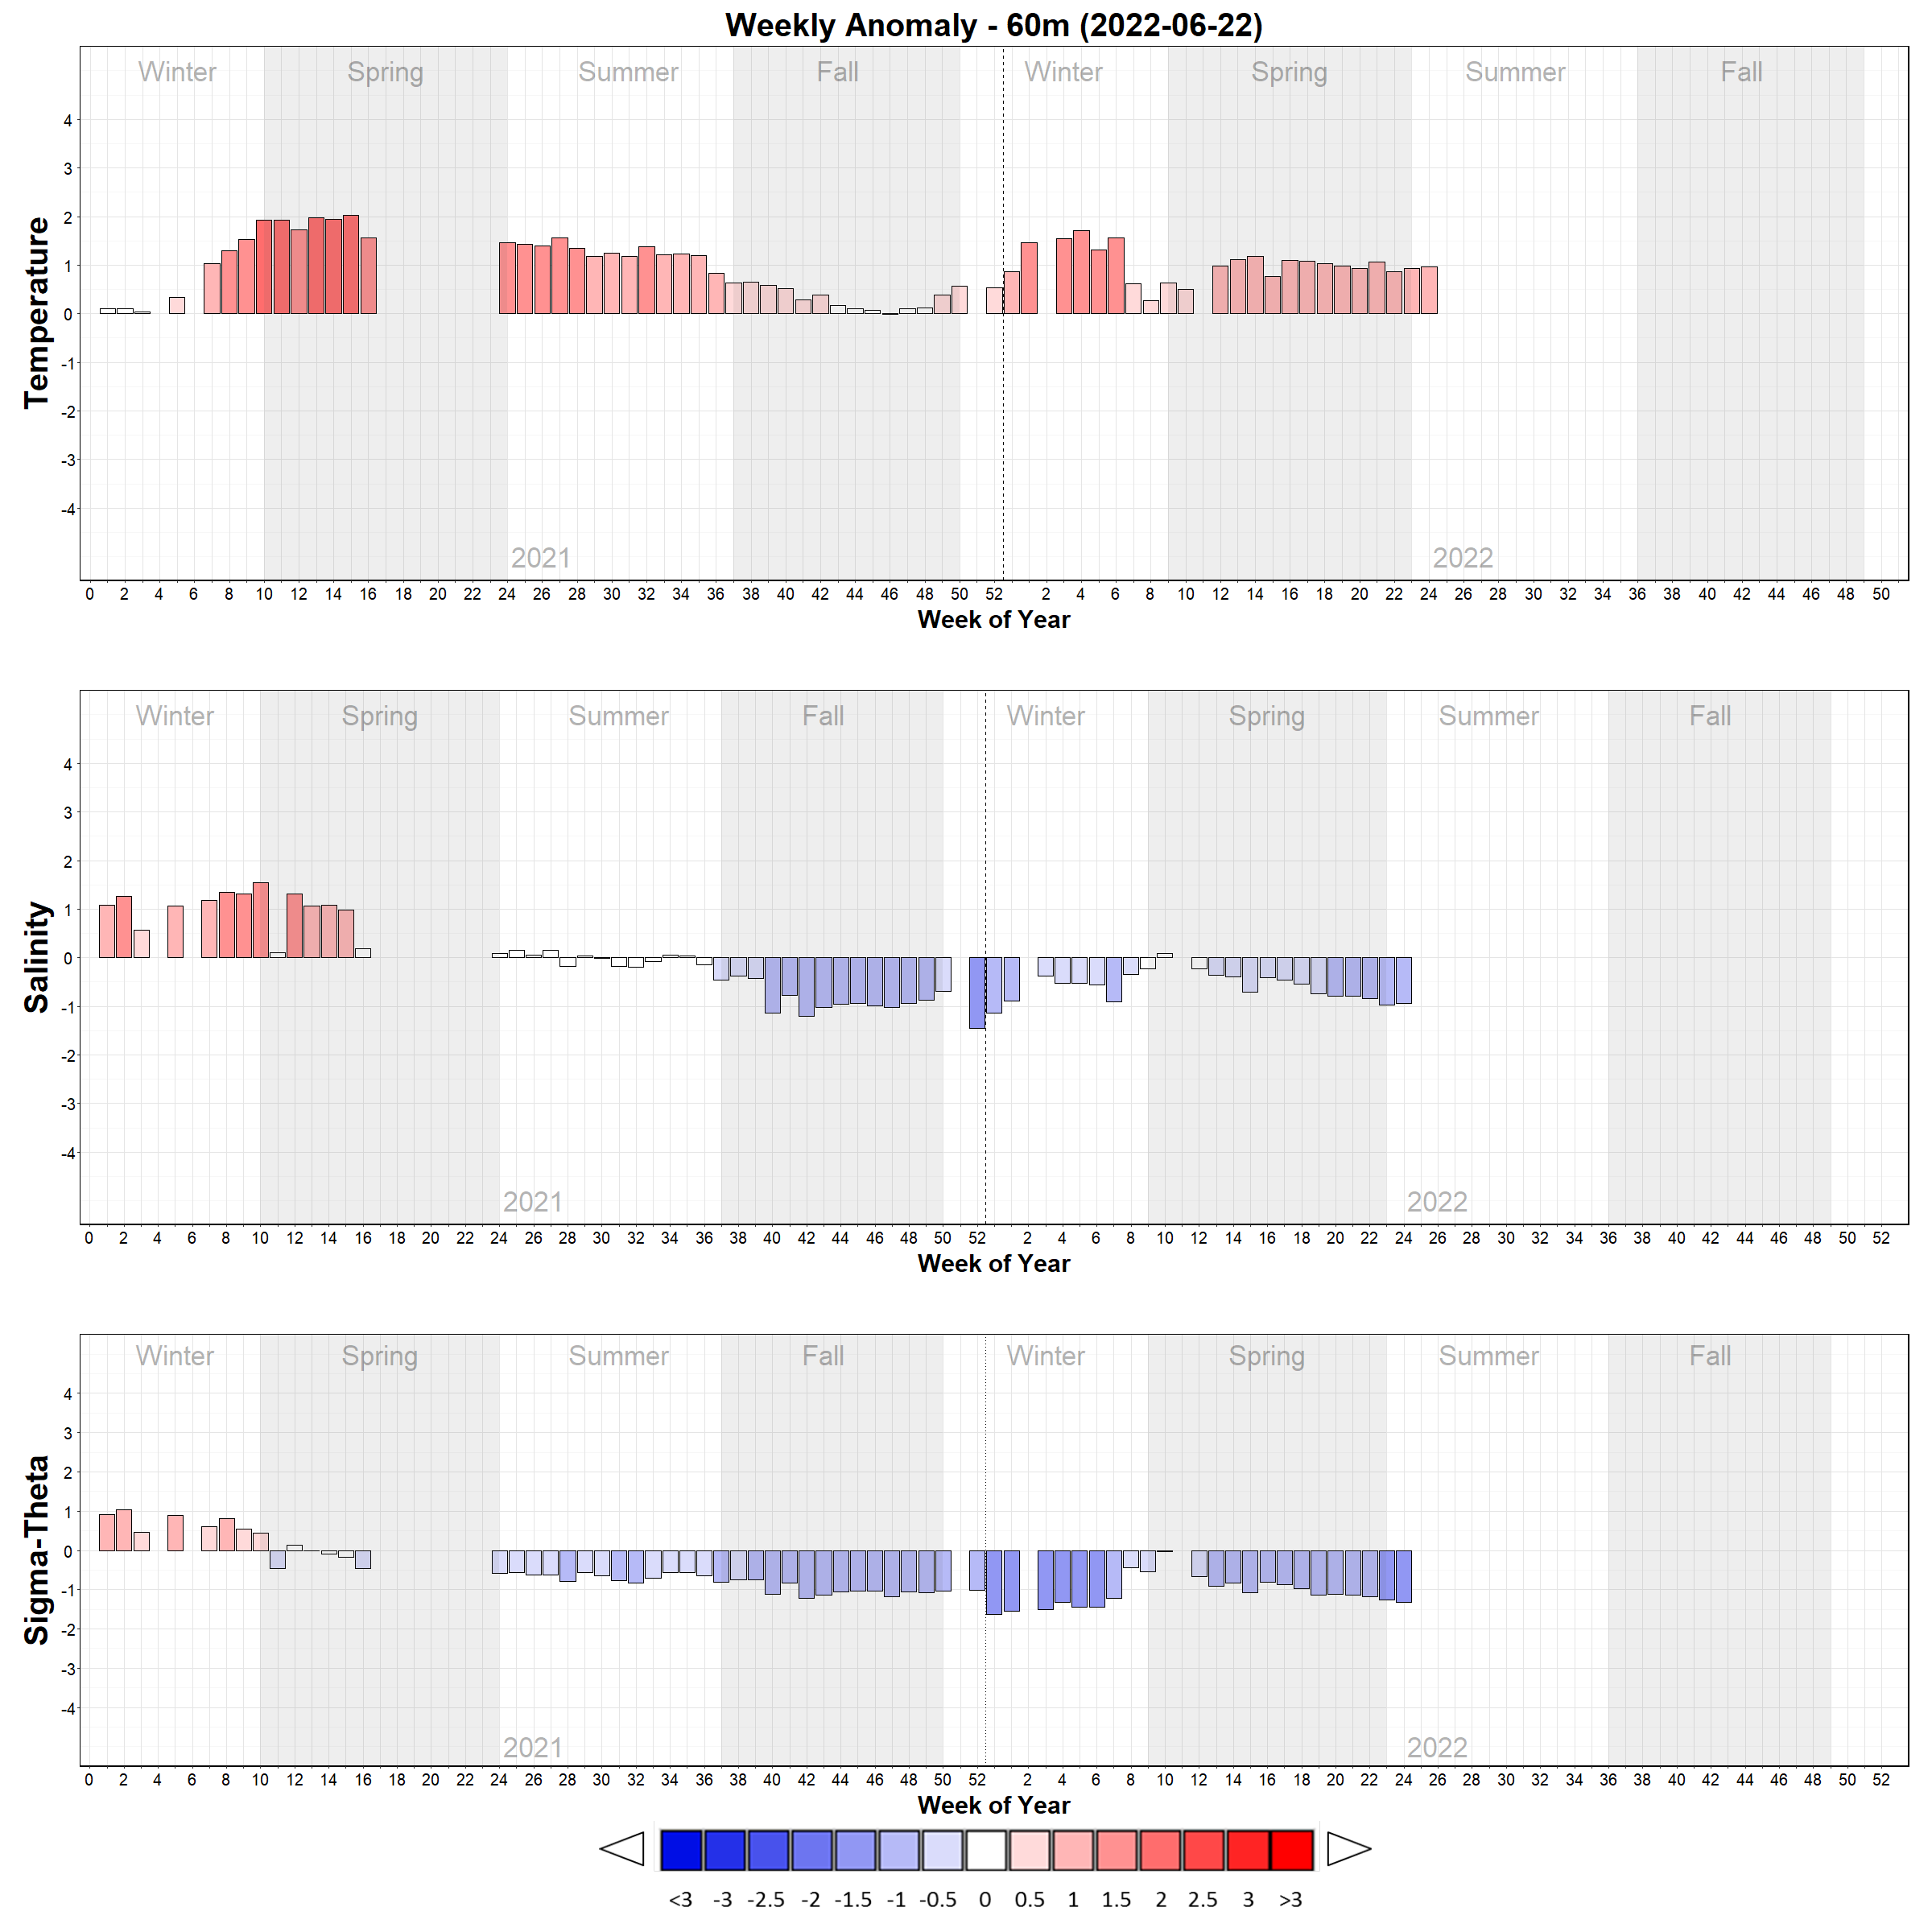 Temperature and Salinity Weekly Anomaly Bar Plots - 60m